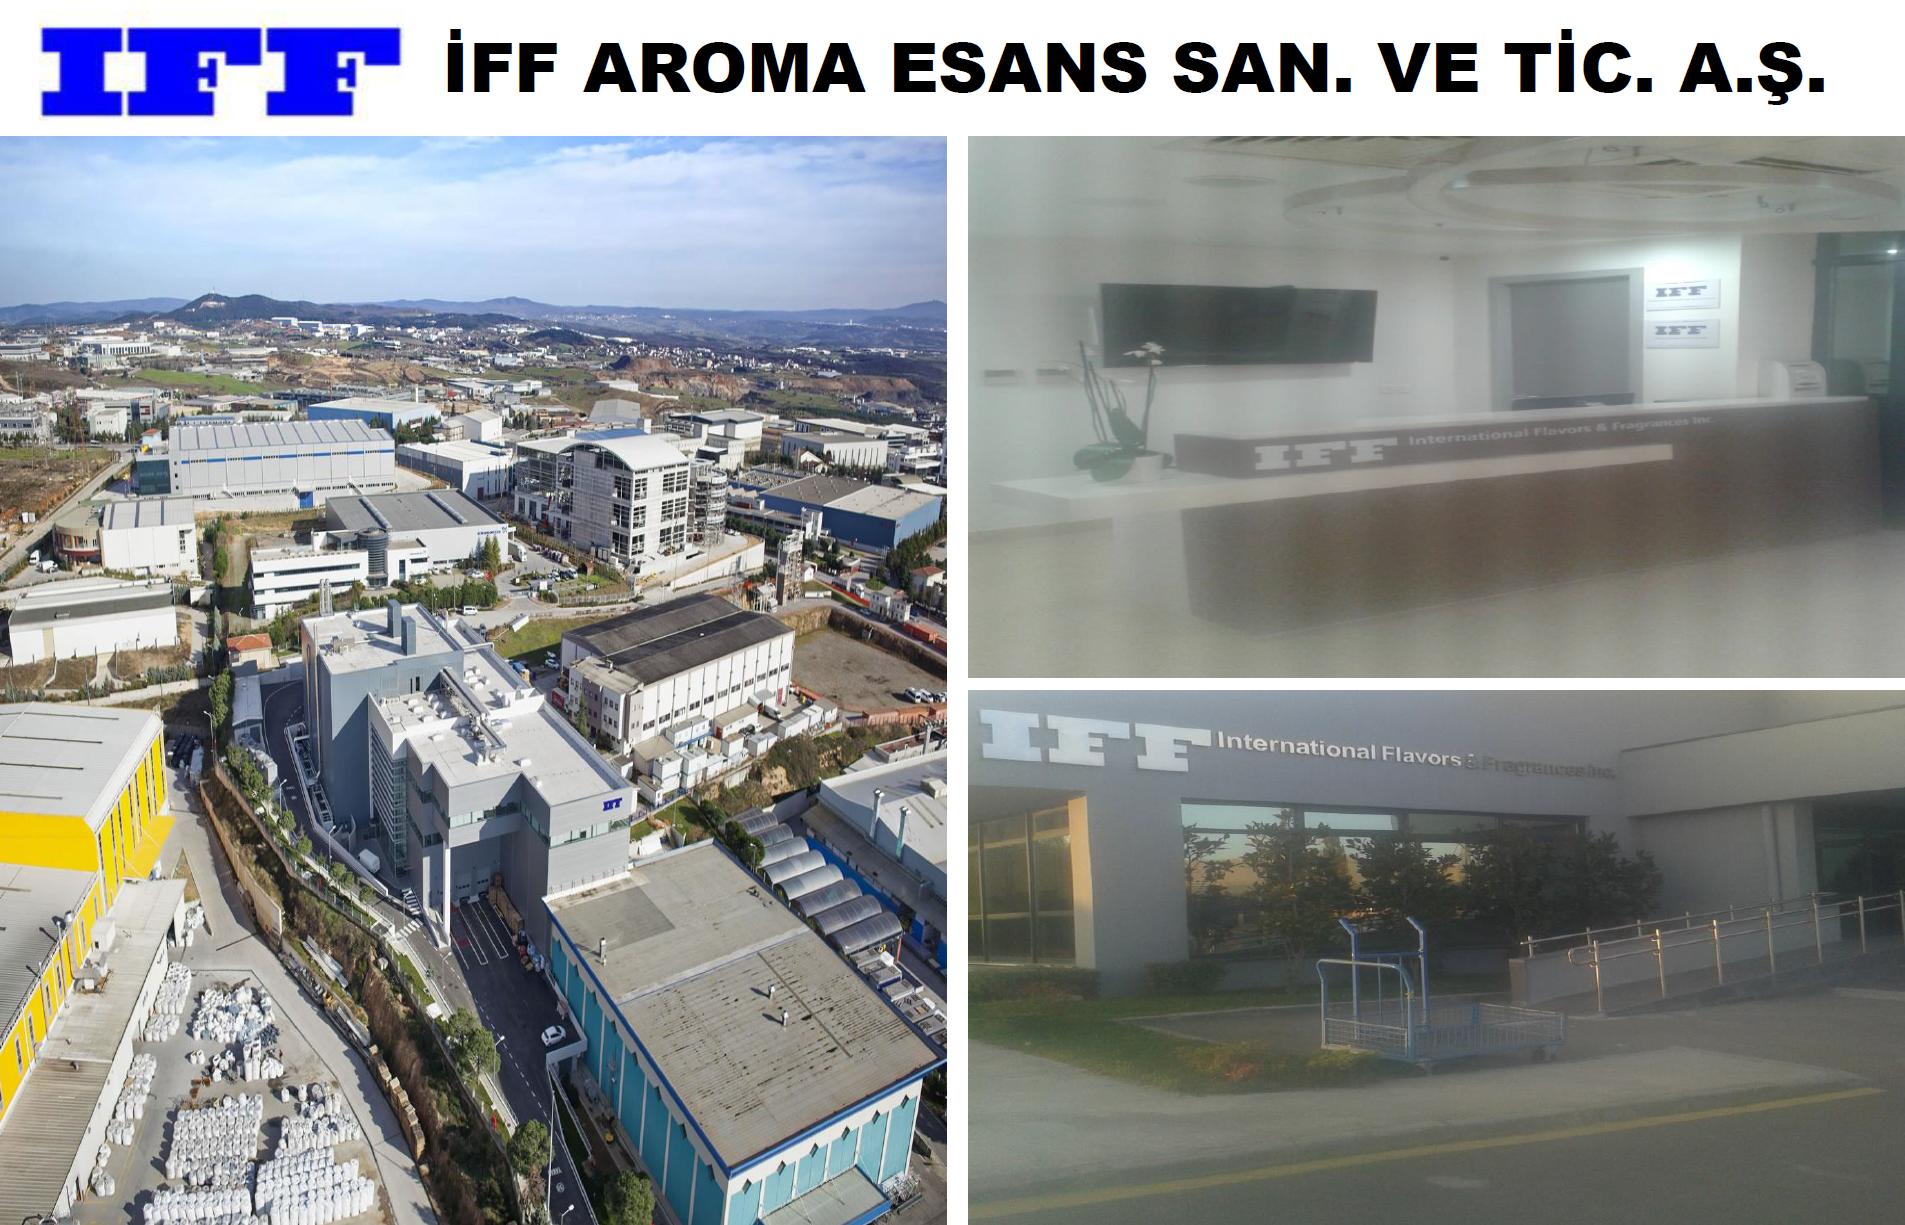 IFF AROMA